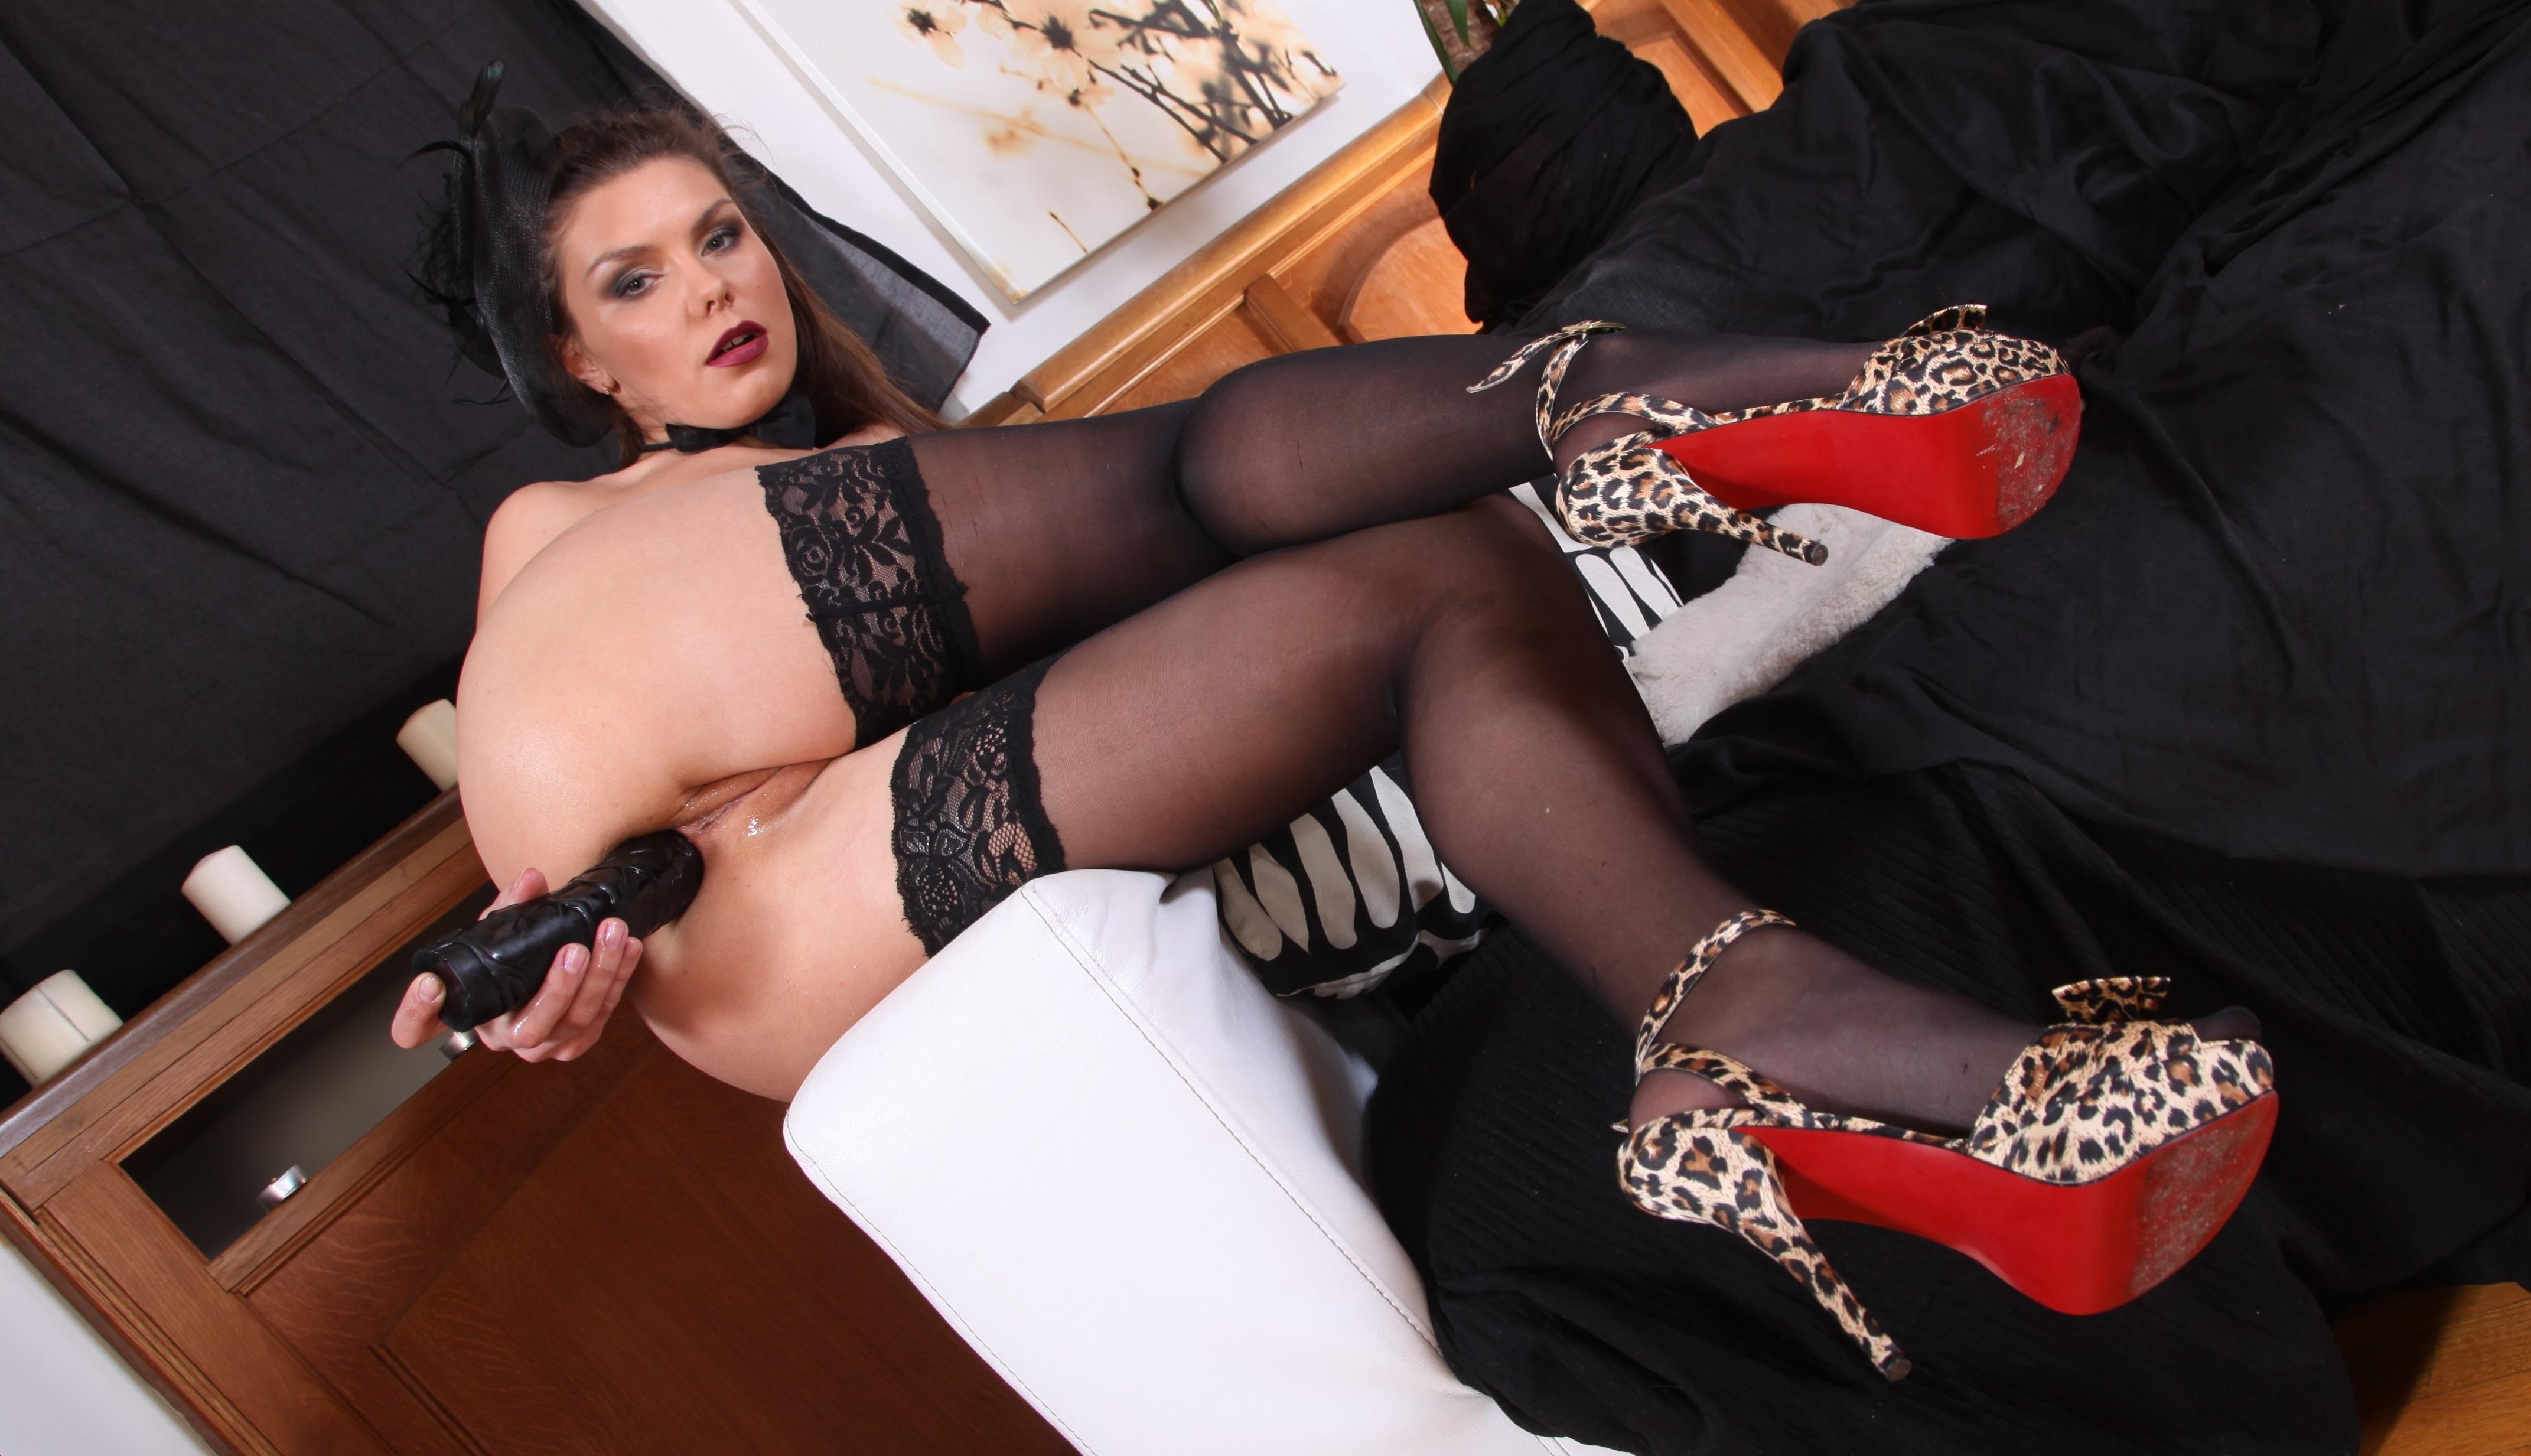 Anal porn high heels